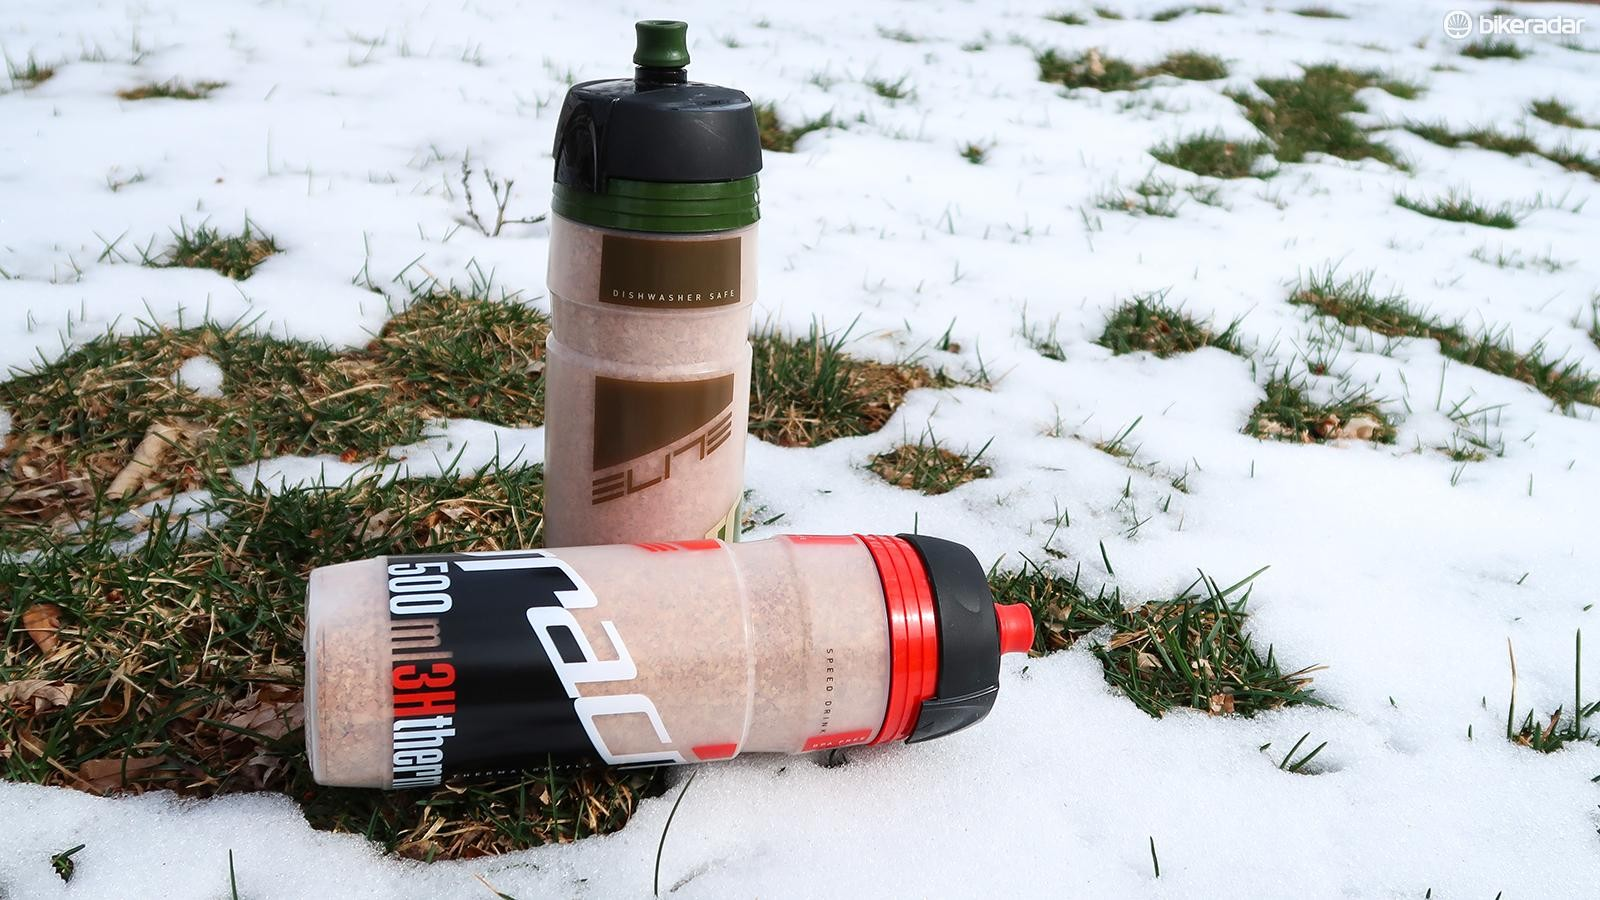 The Elite Turacio insulated water bottle